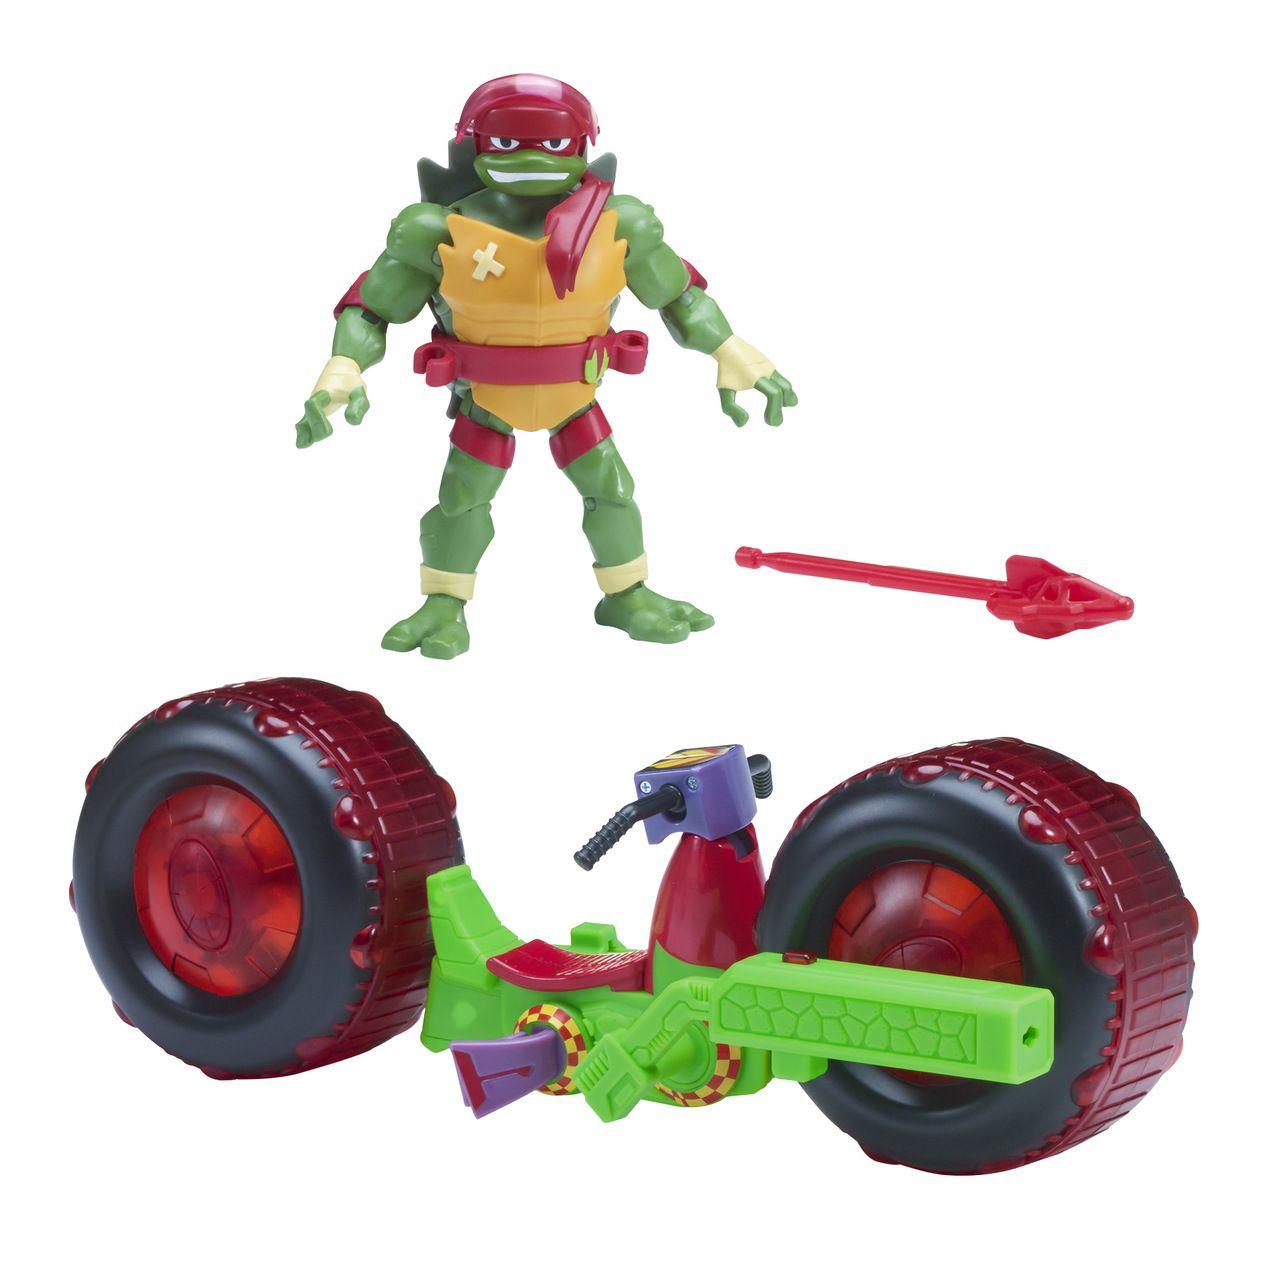 Tartarugas Ninja - Figura e Veículo - Boneco Raphael - Sunny